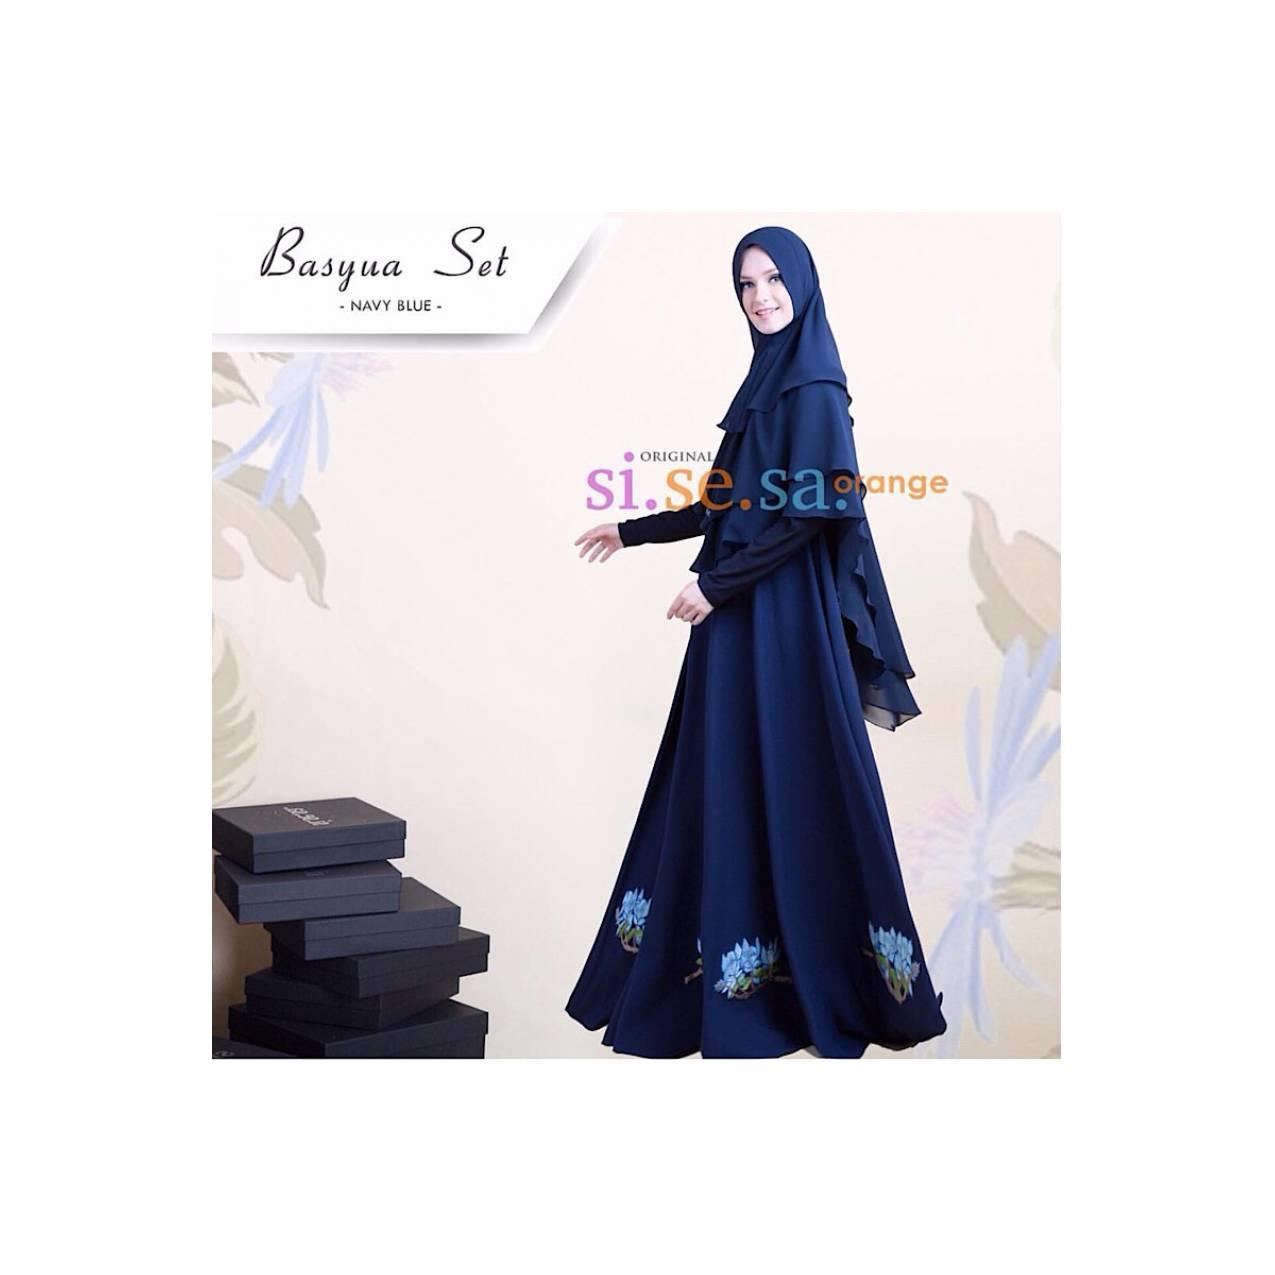 Basyua Dress by Sisesa